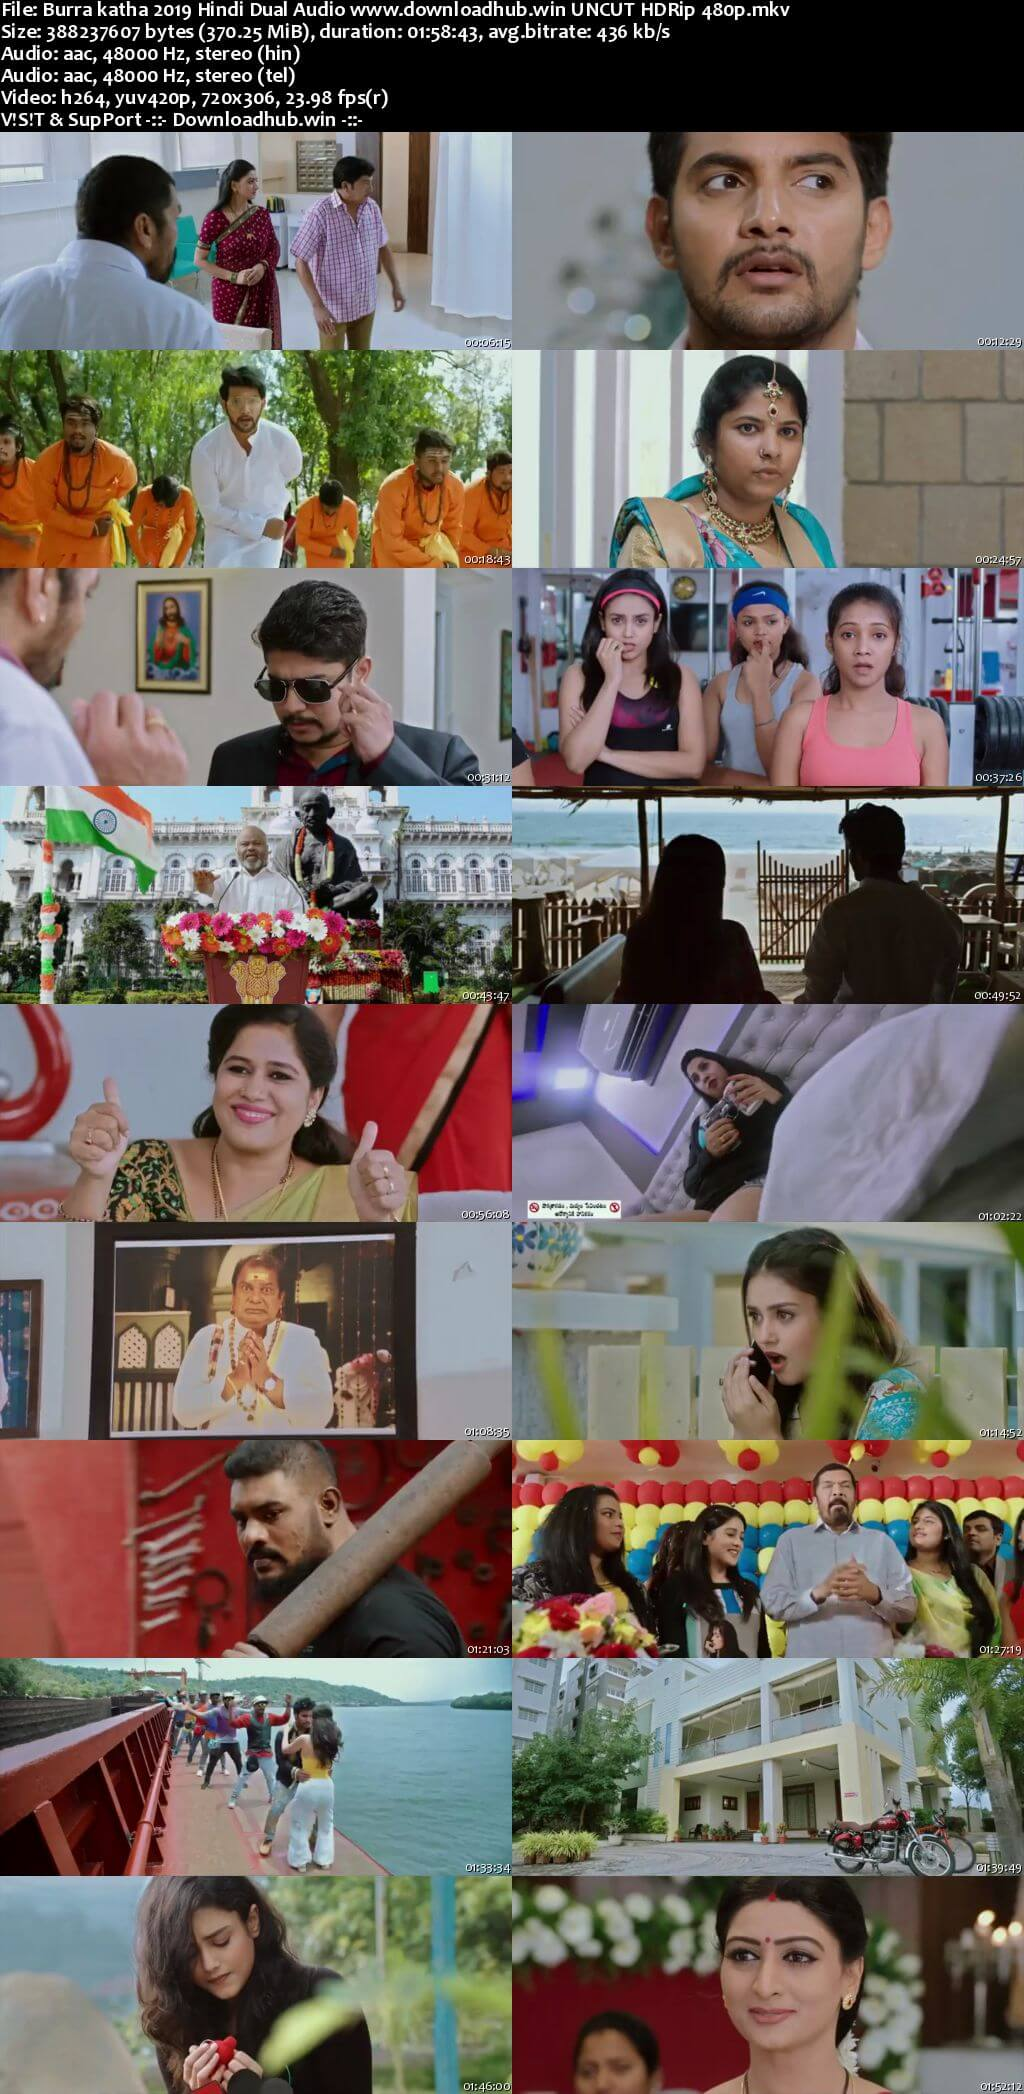 Burra katha 2019 Hindi Dual Audio 350MB UNCUT HDRip 480p